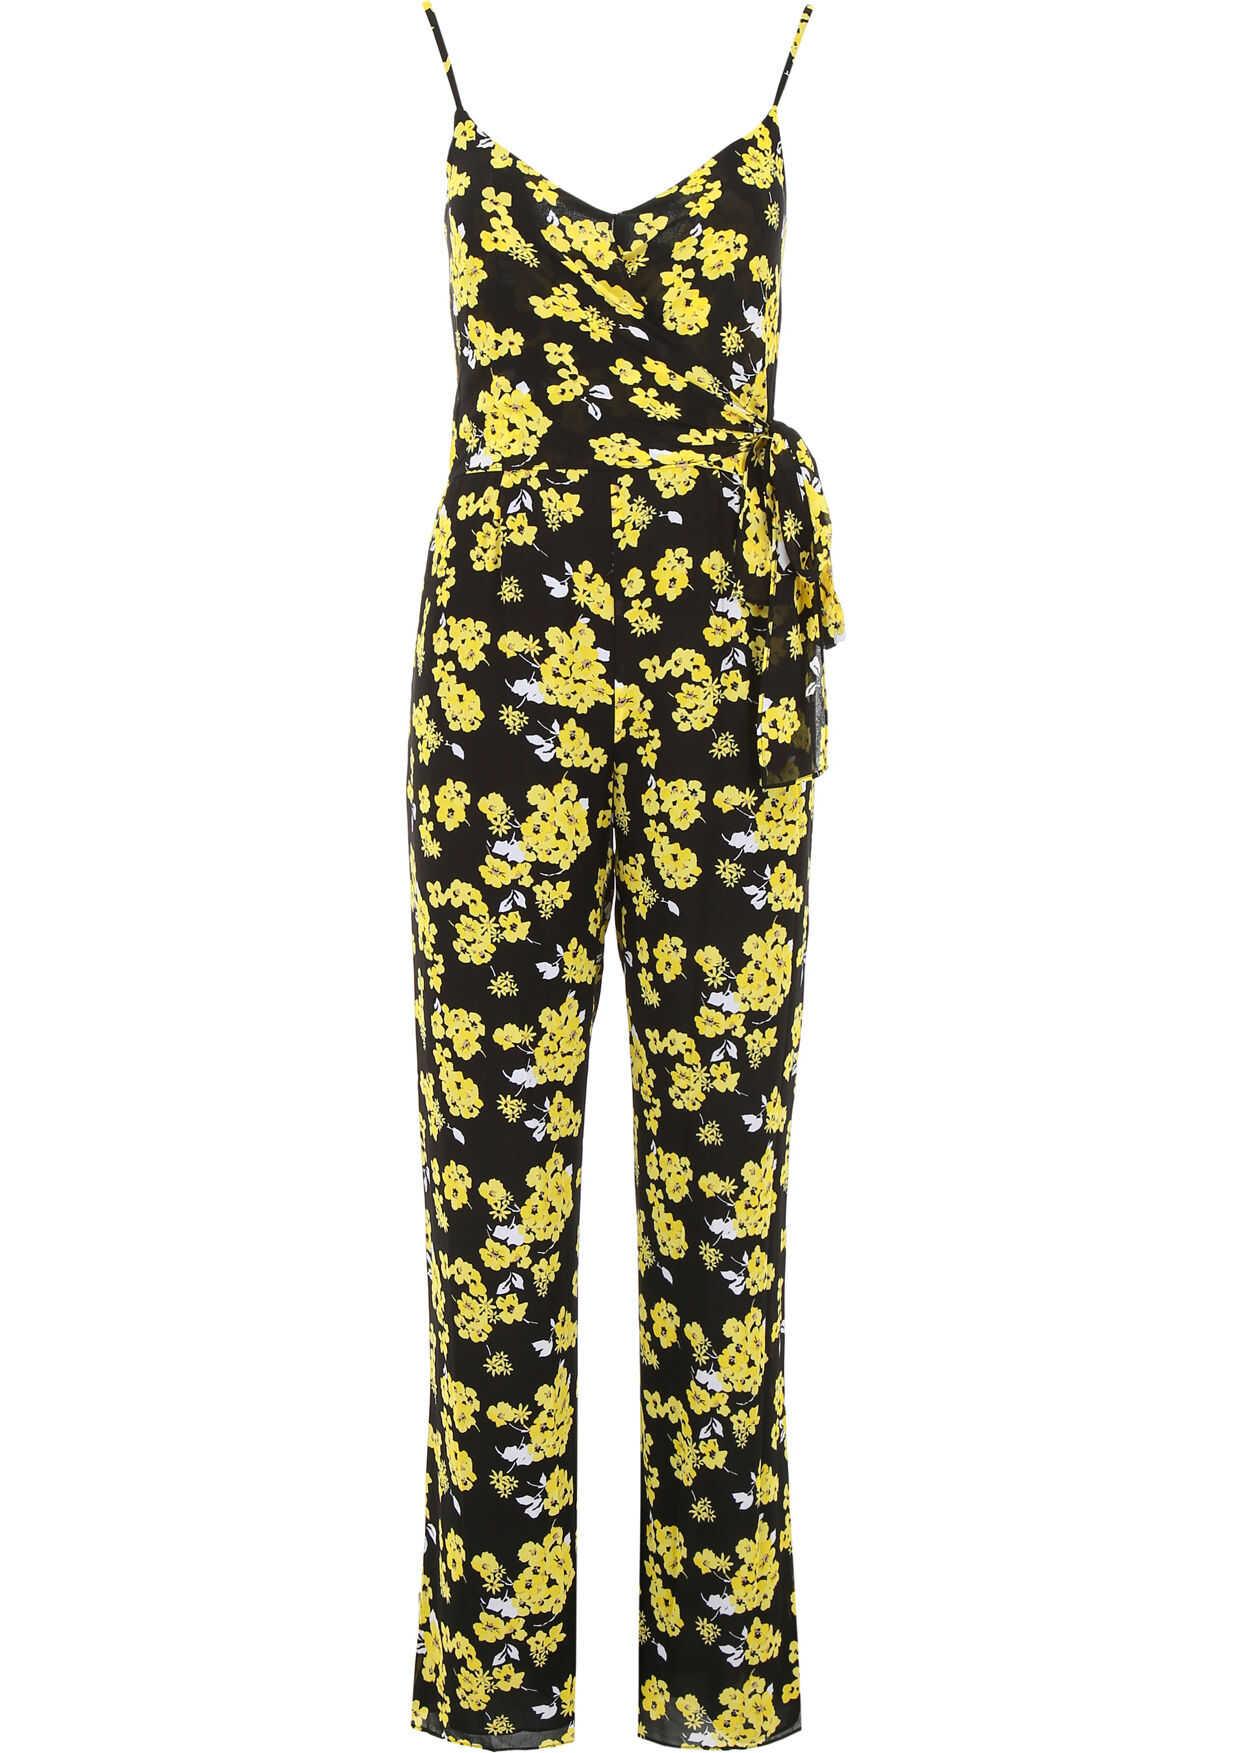 Michael Kors Floral-Printed Jumpsuit BLK GLDN YLLW